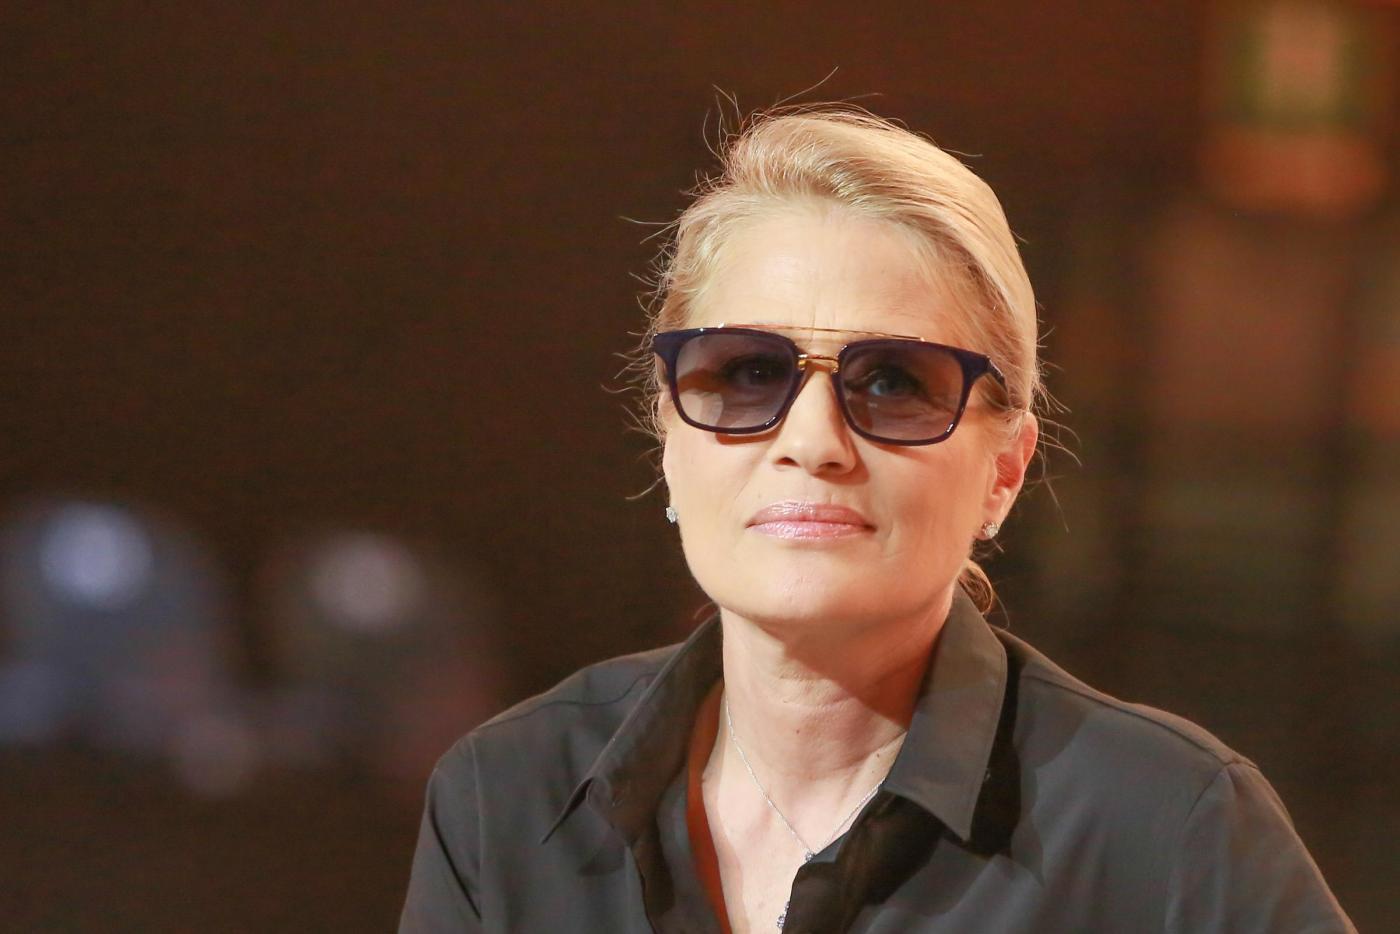 Heather Parisi contro Nemicamatissima: 'Mi sono sentita un'ospite'